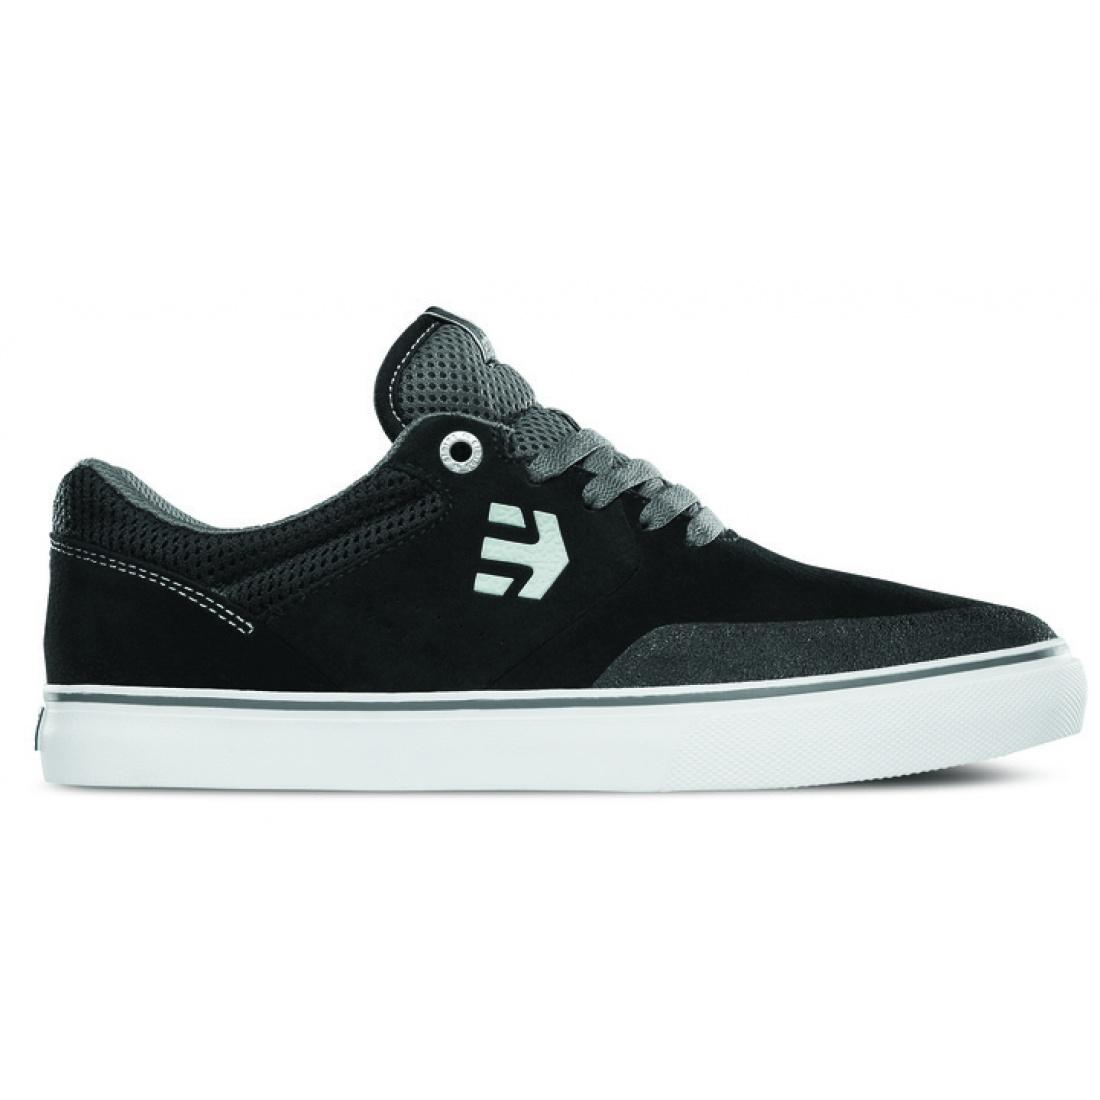 ETN-Marana Vulc Black/Grey Shoes